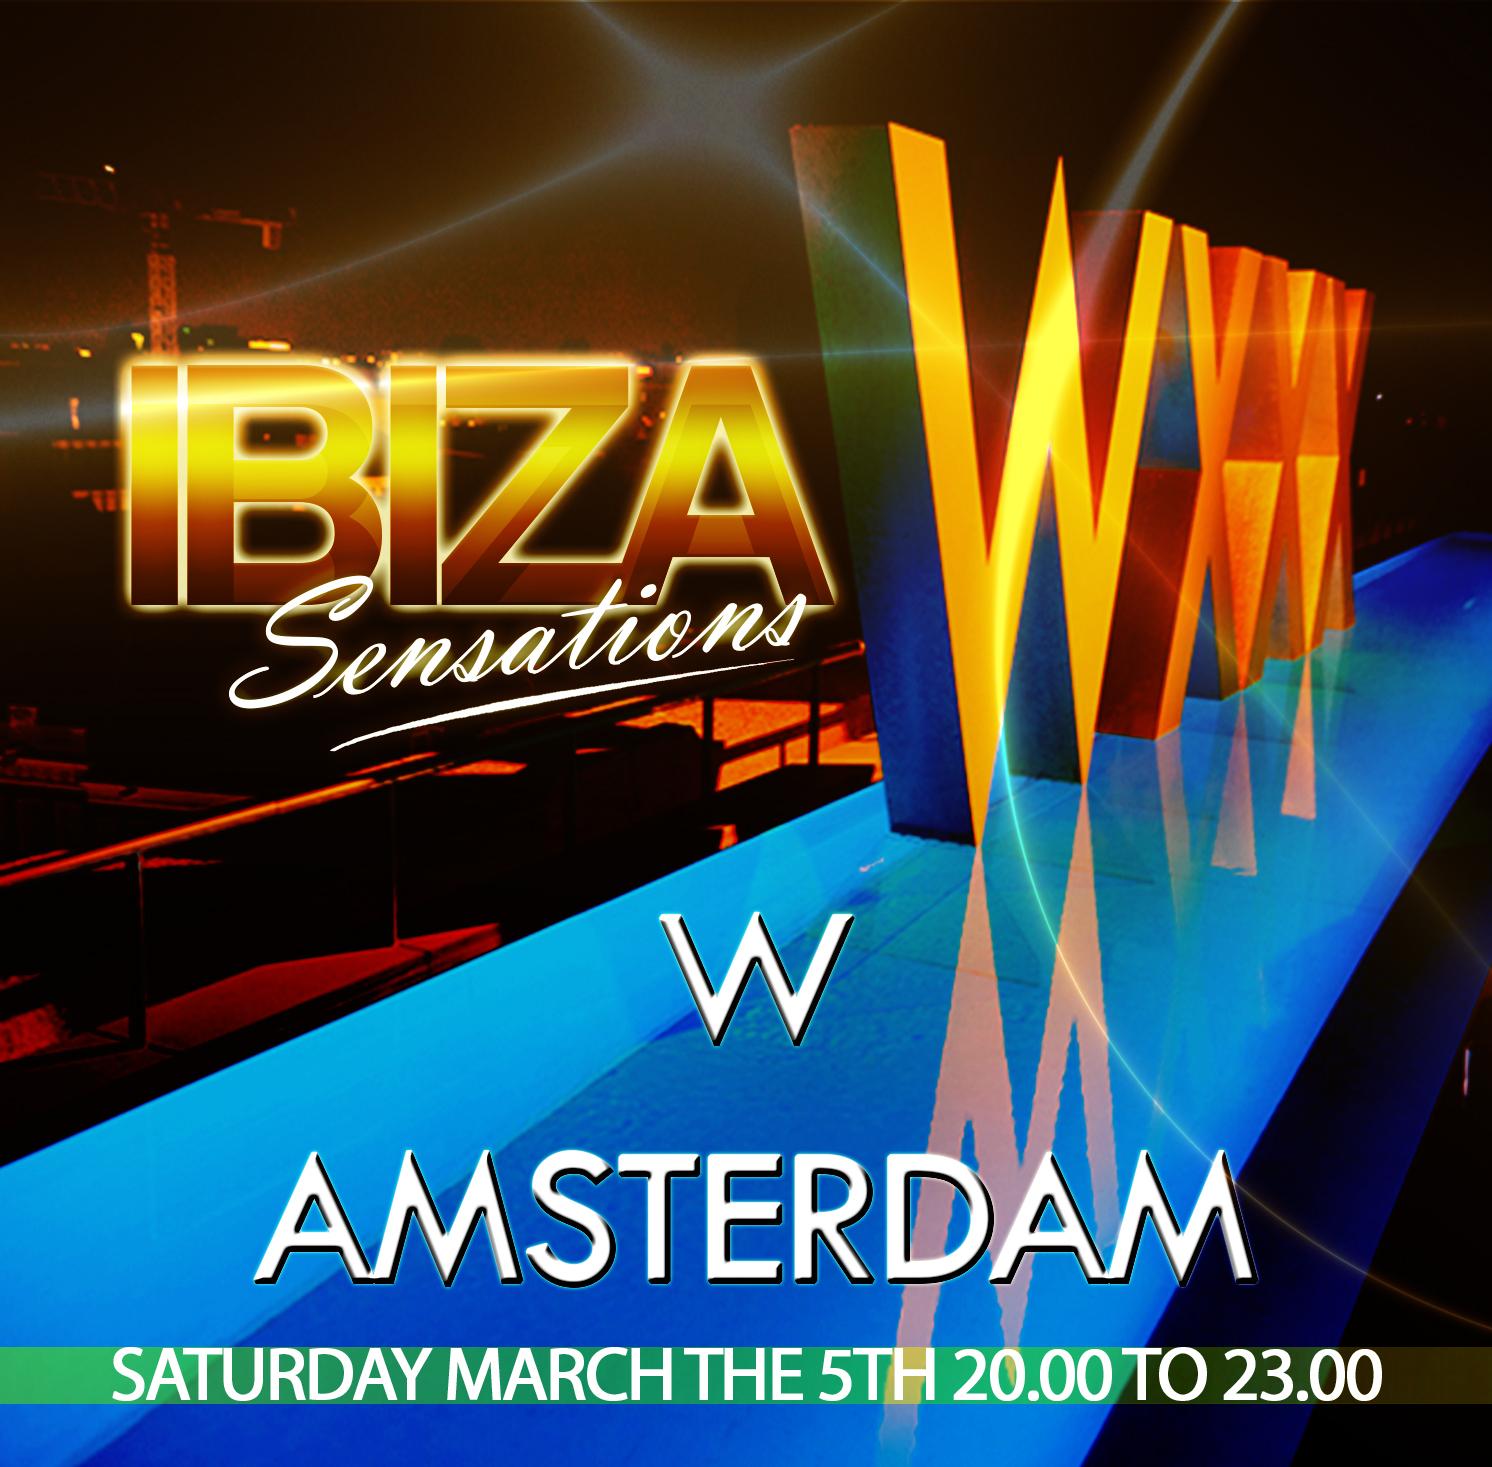 Ibiza Sensations 134 @ Hotel W Amsterdam next march the 5th